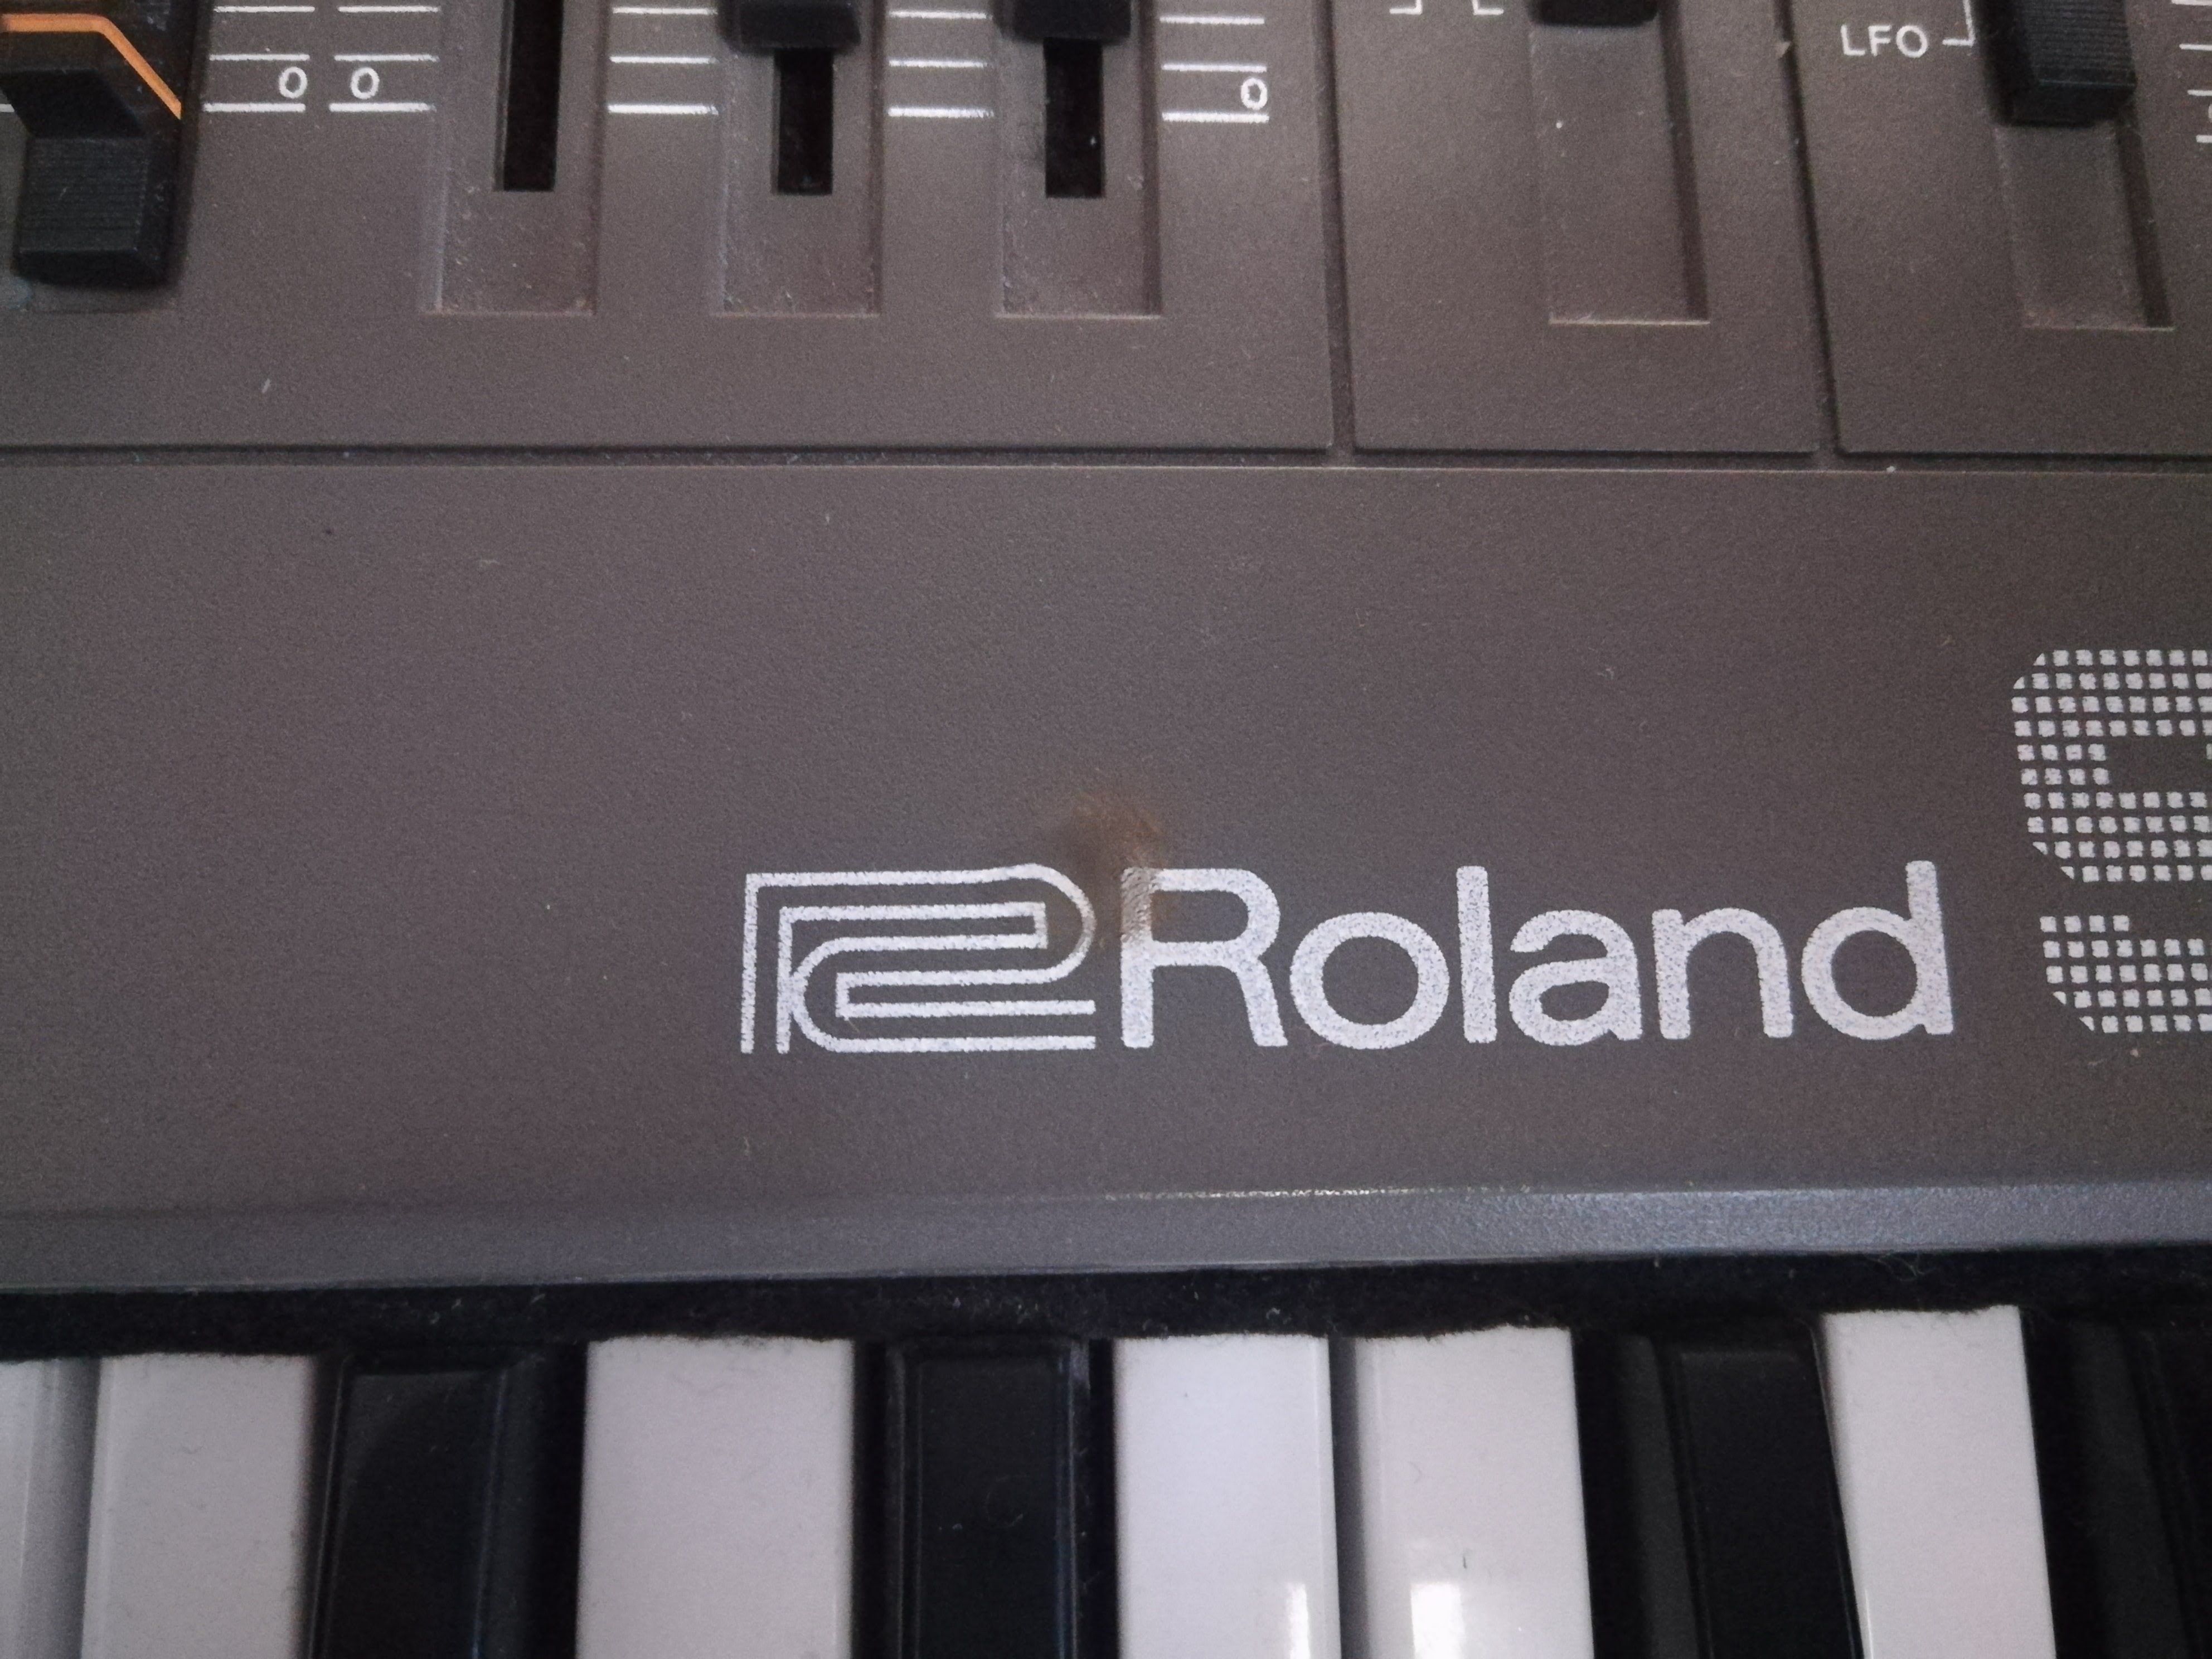 sh-101 - roland sh-101